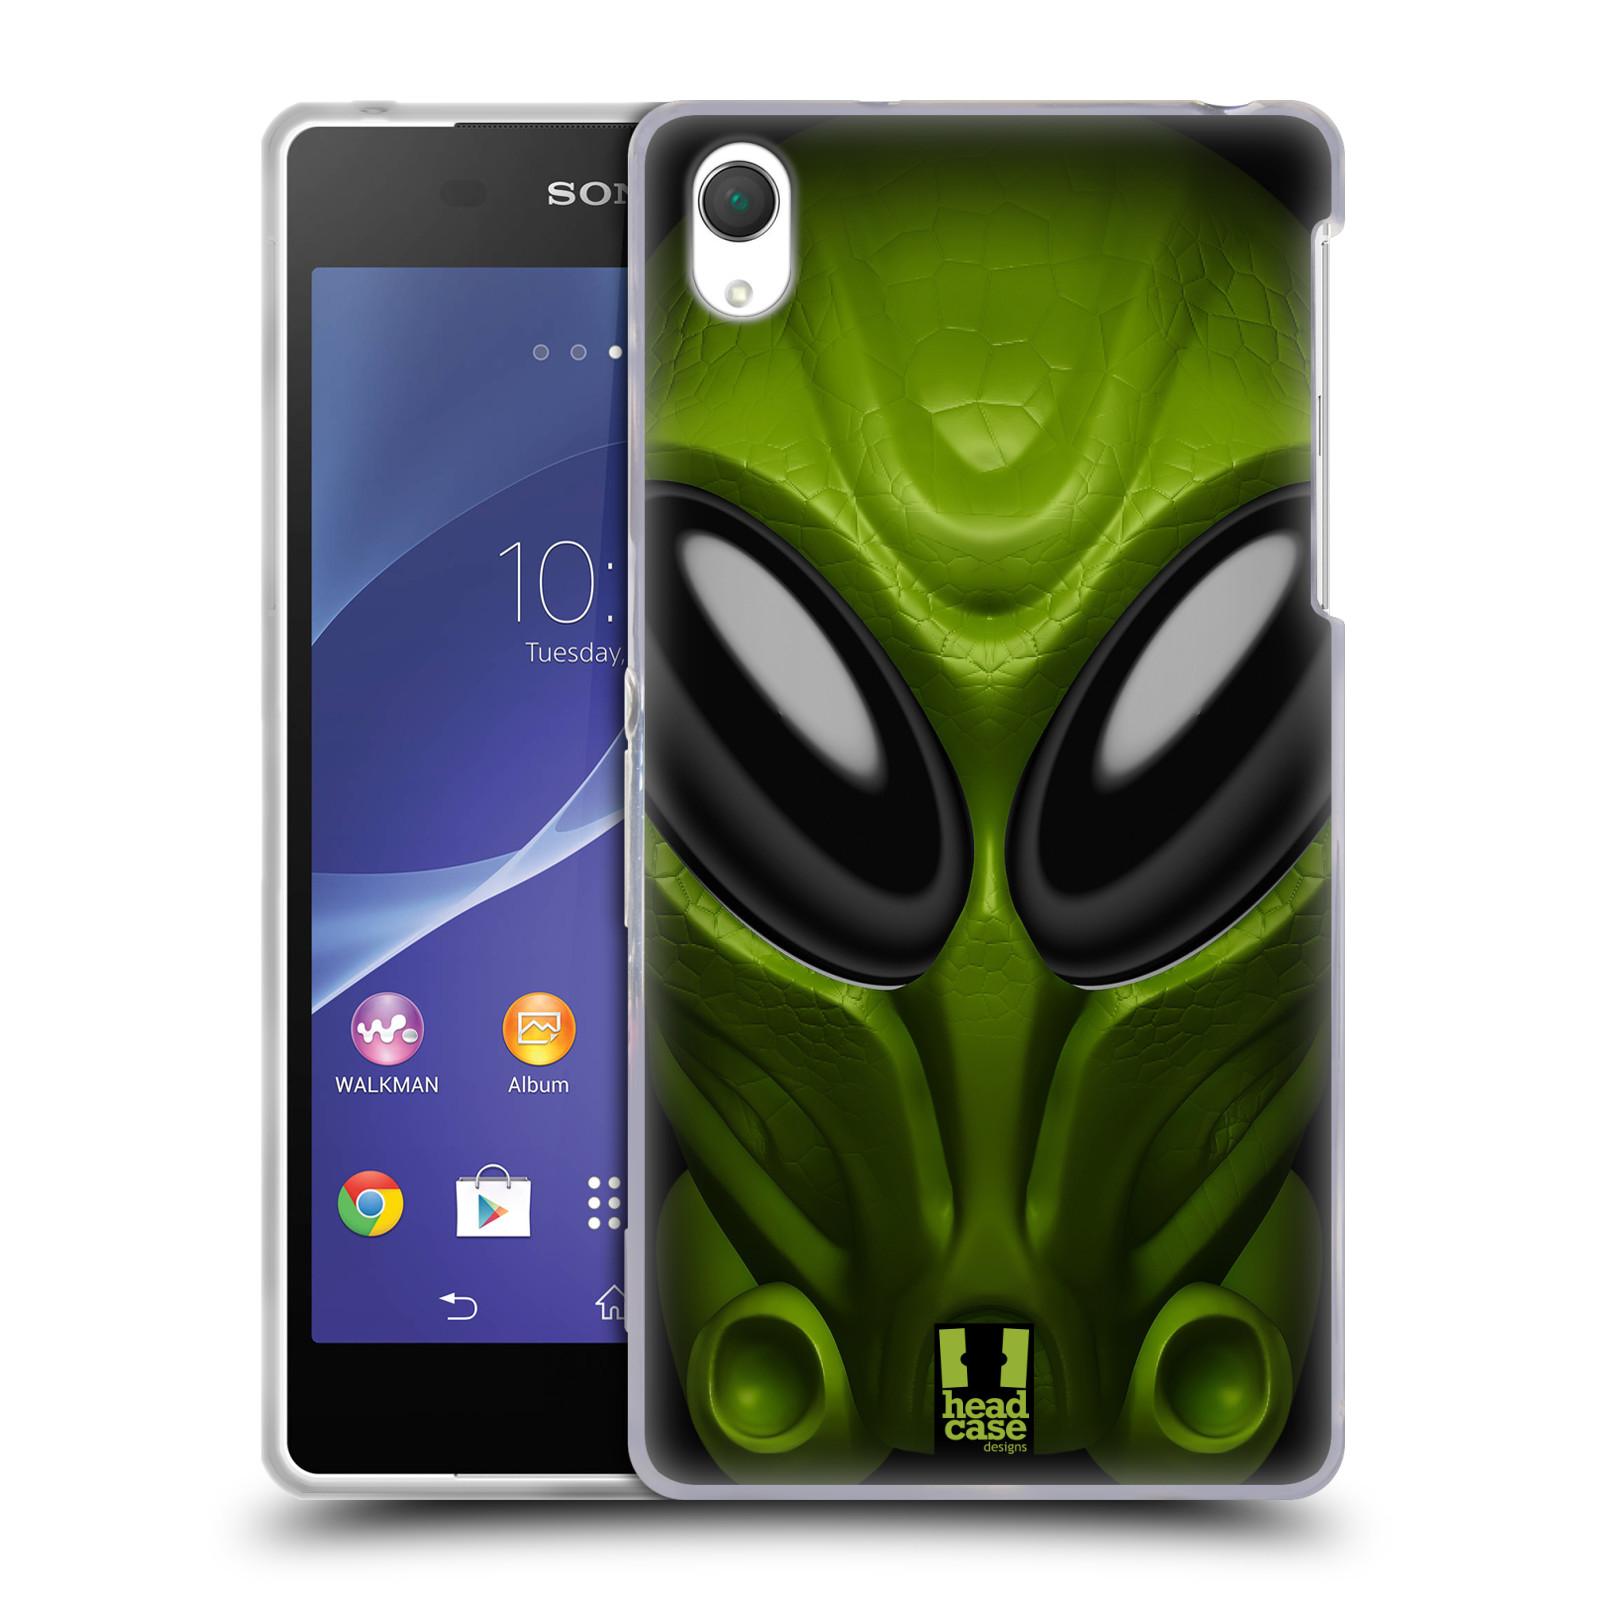 Silikonové pouzdro na mobil Sony Xperia Z2 D6503 - Head Case - Ufoun Mastermind